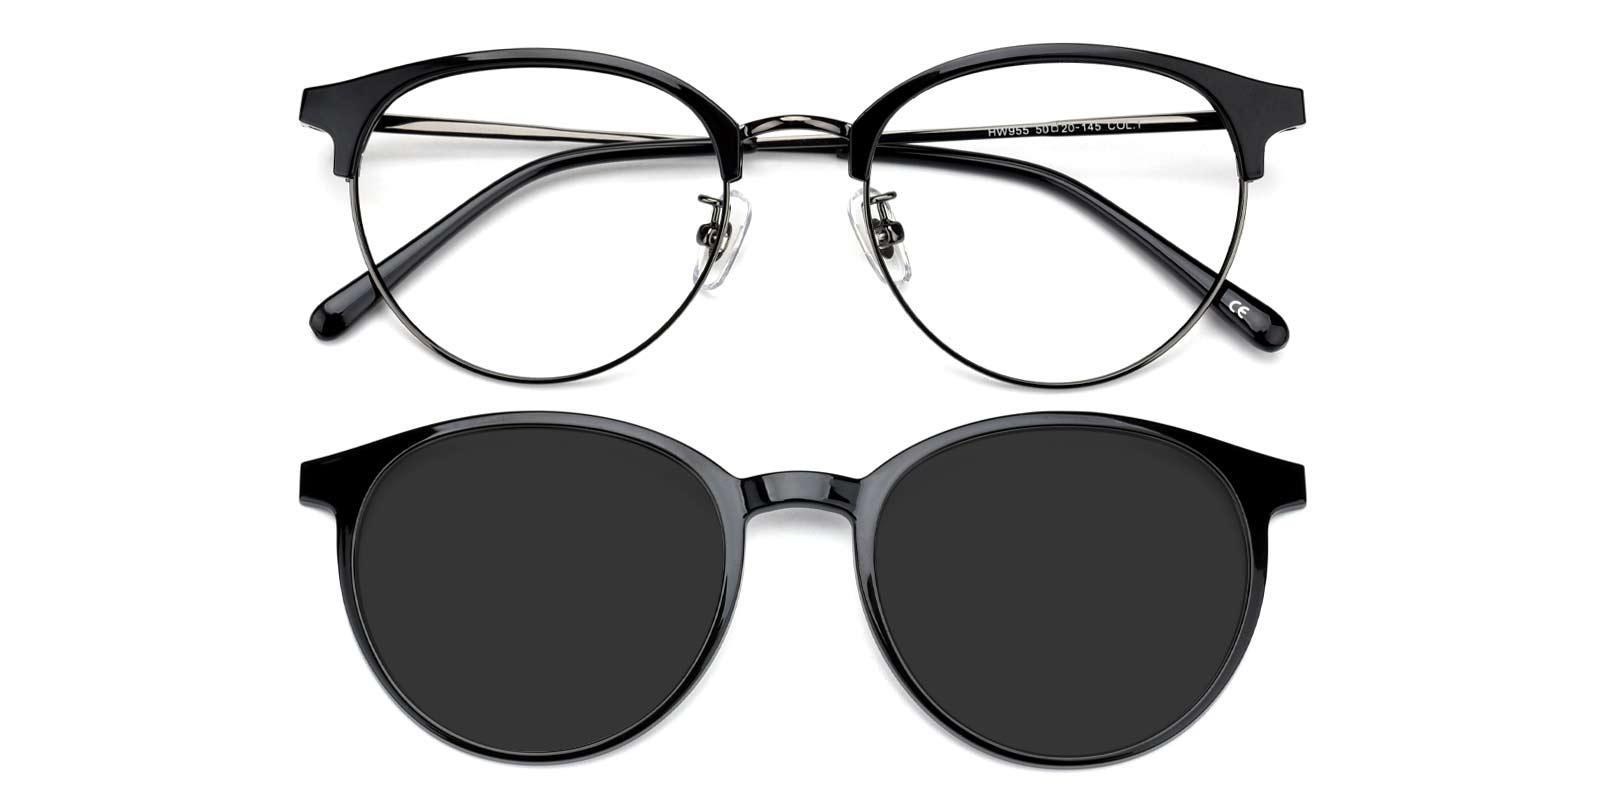 Gaze-Black-Browline-Metal-Eyeglasses-detail